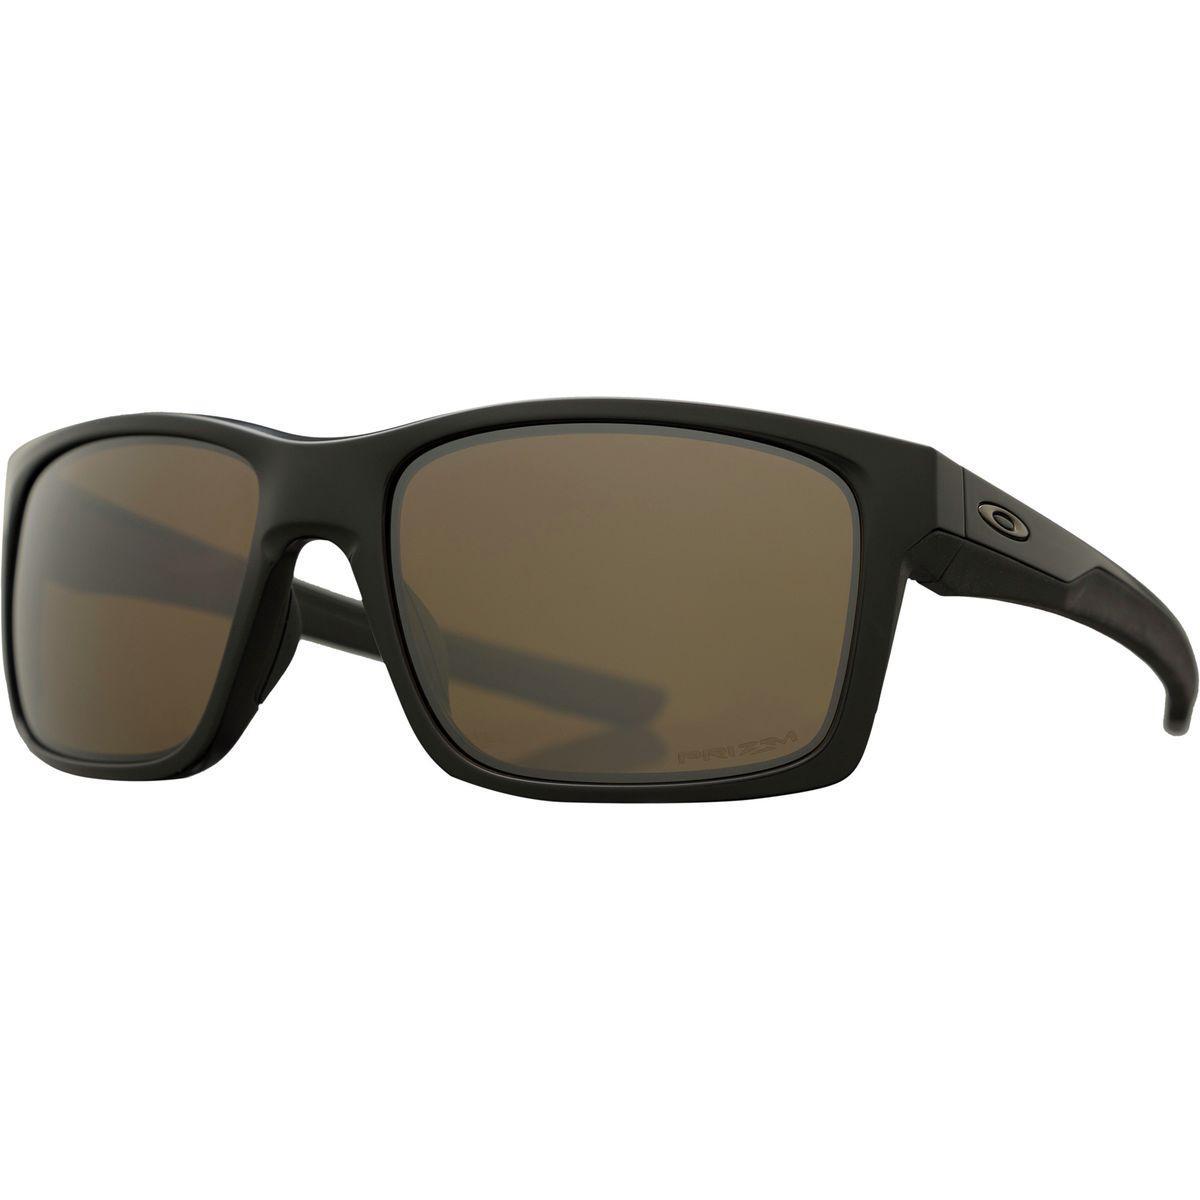 a7244c3d851c3 Lyst - Oakley Mainlink Prizm Sunglasses - Polarized in Black for Men